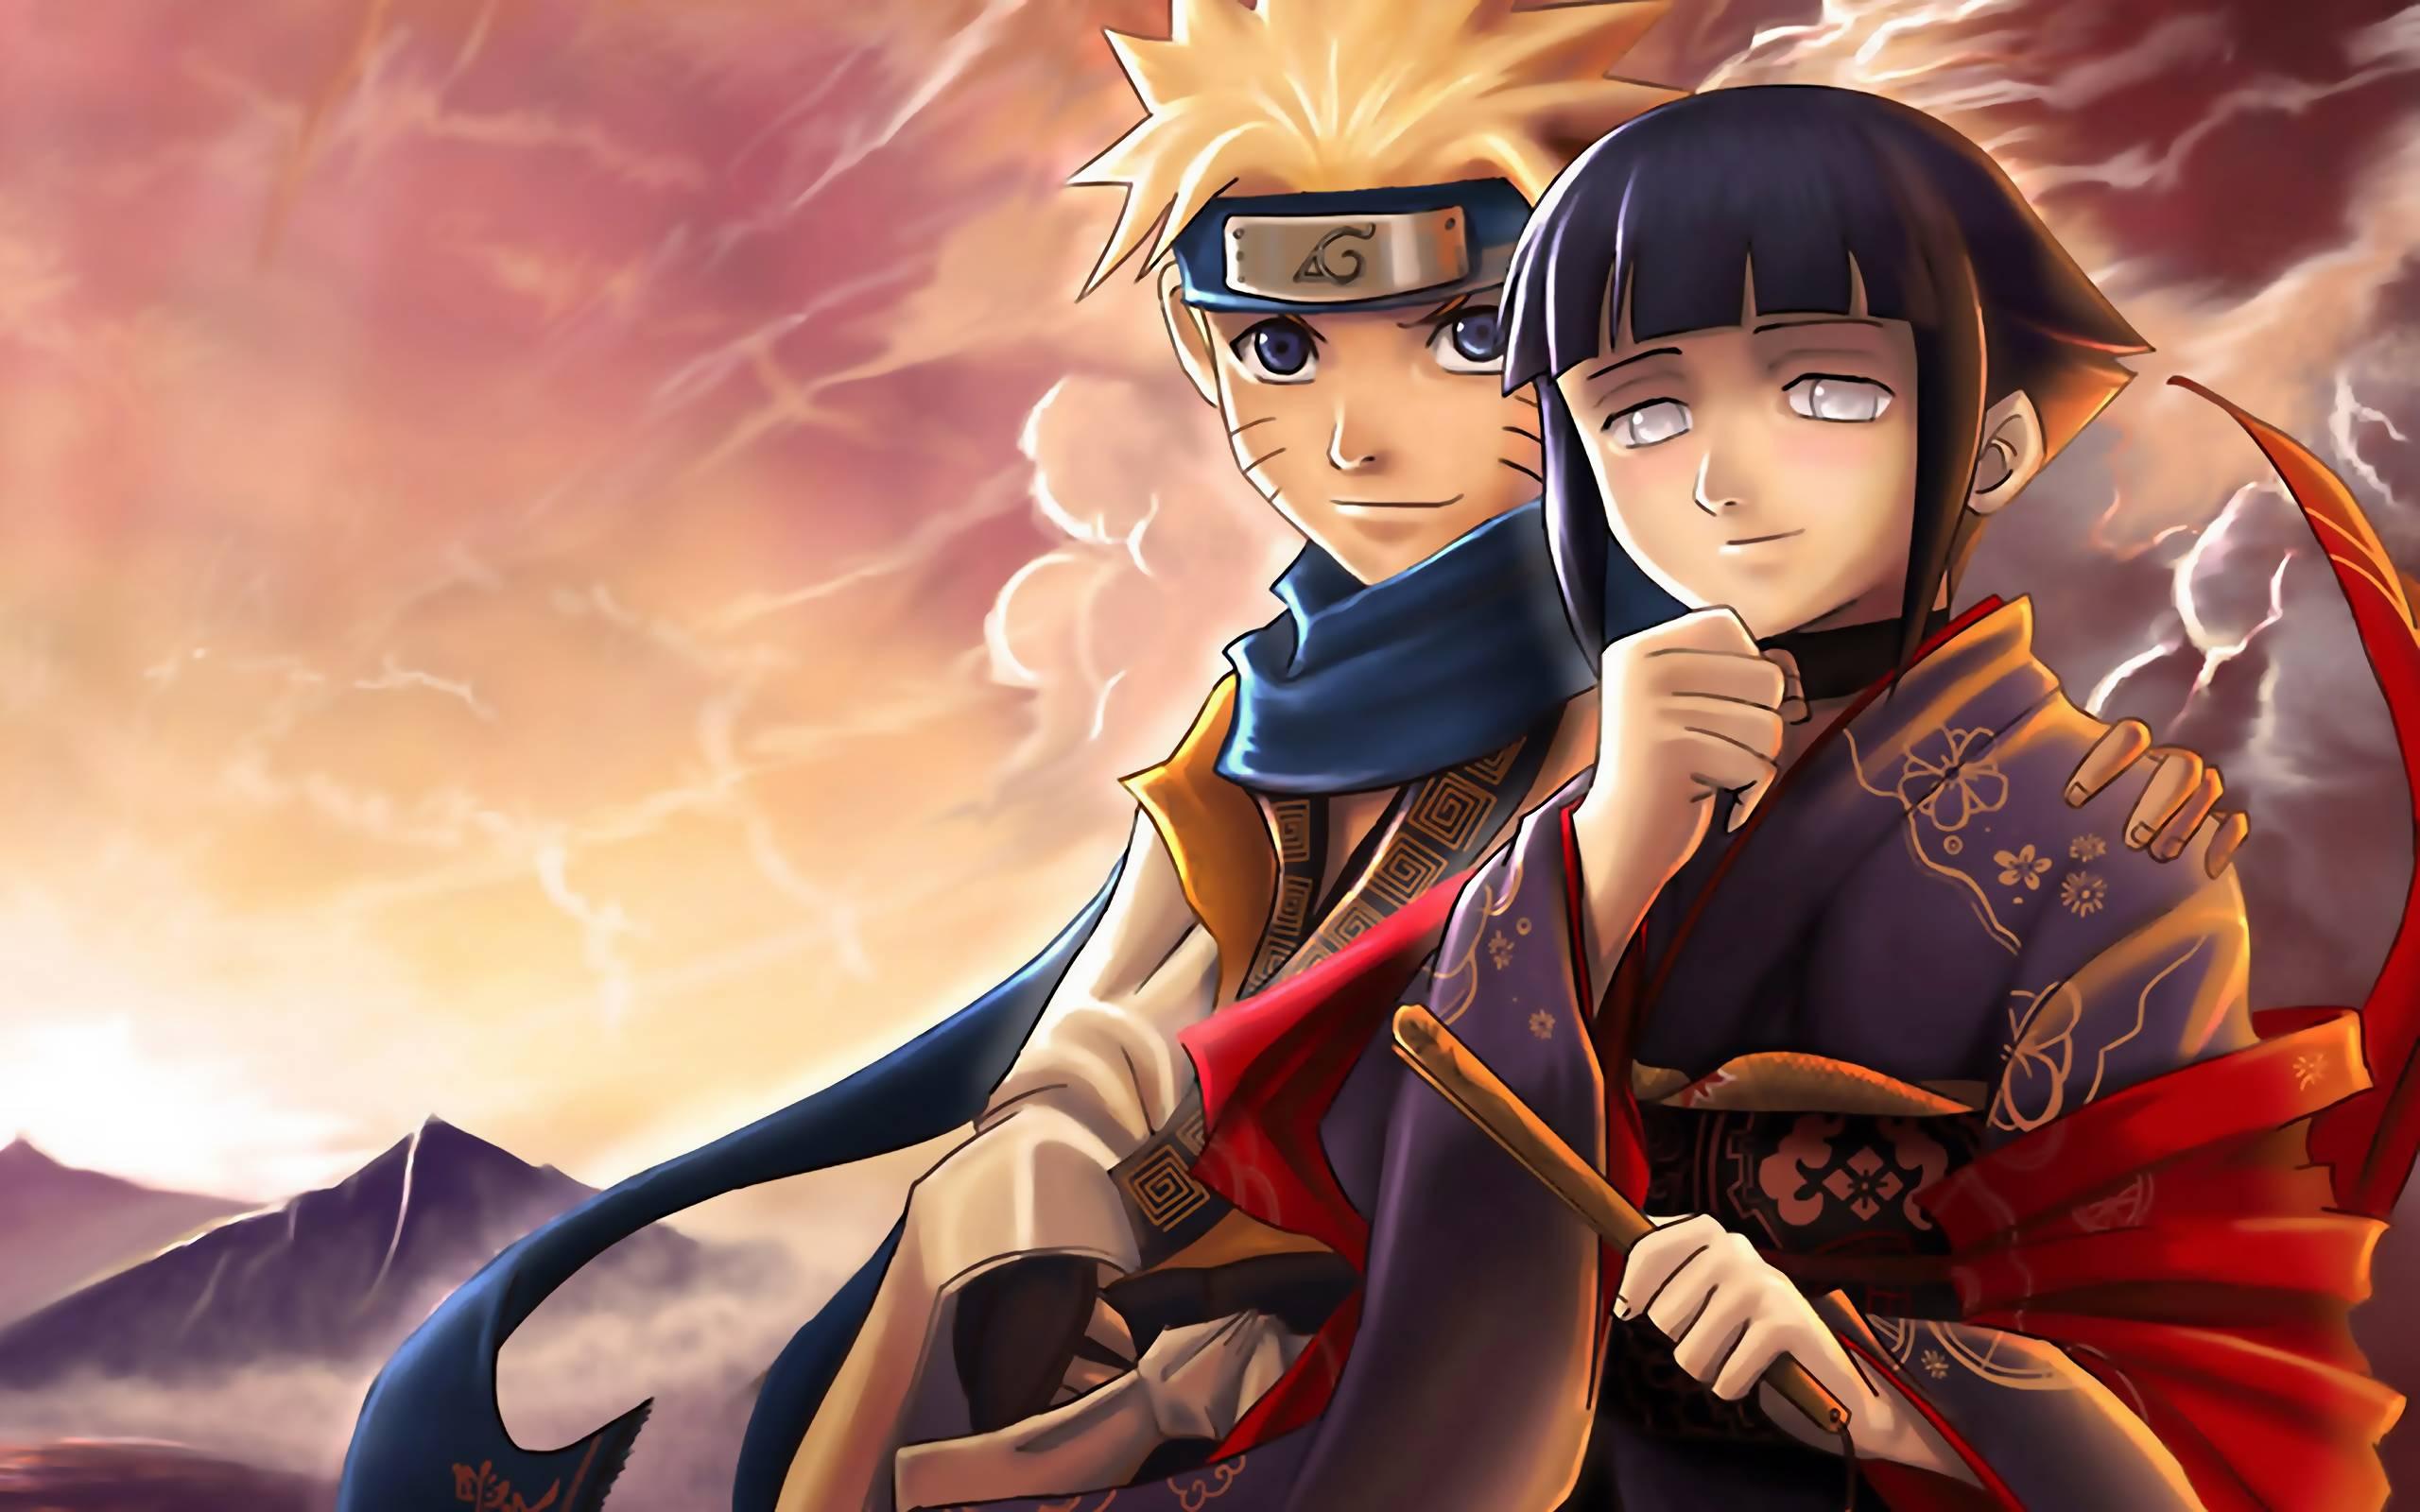 Download the Naruto anime wallpaper titled Hinata with Naruto 2560x1600